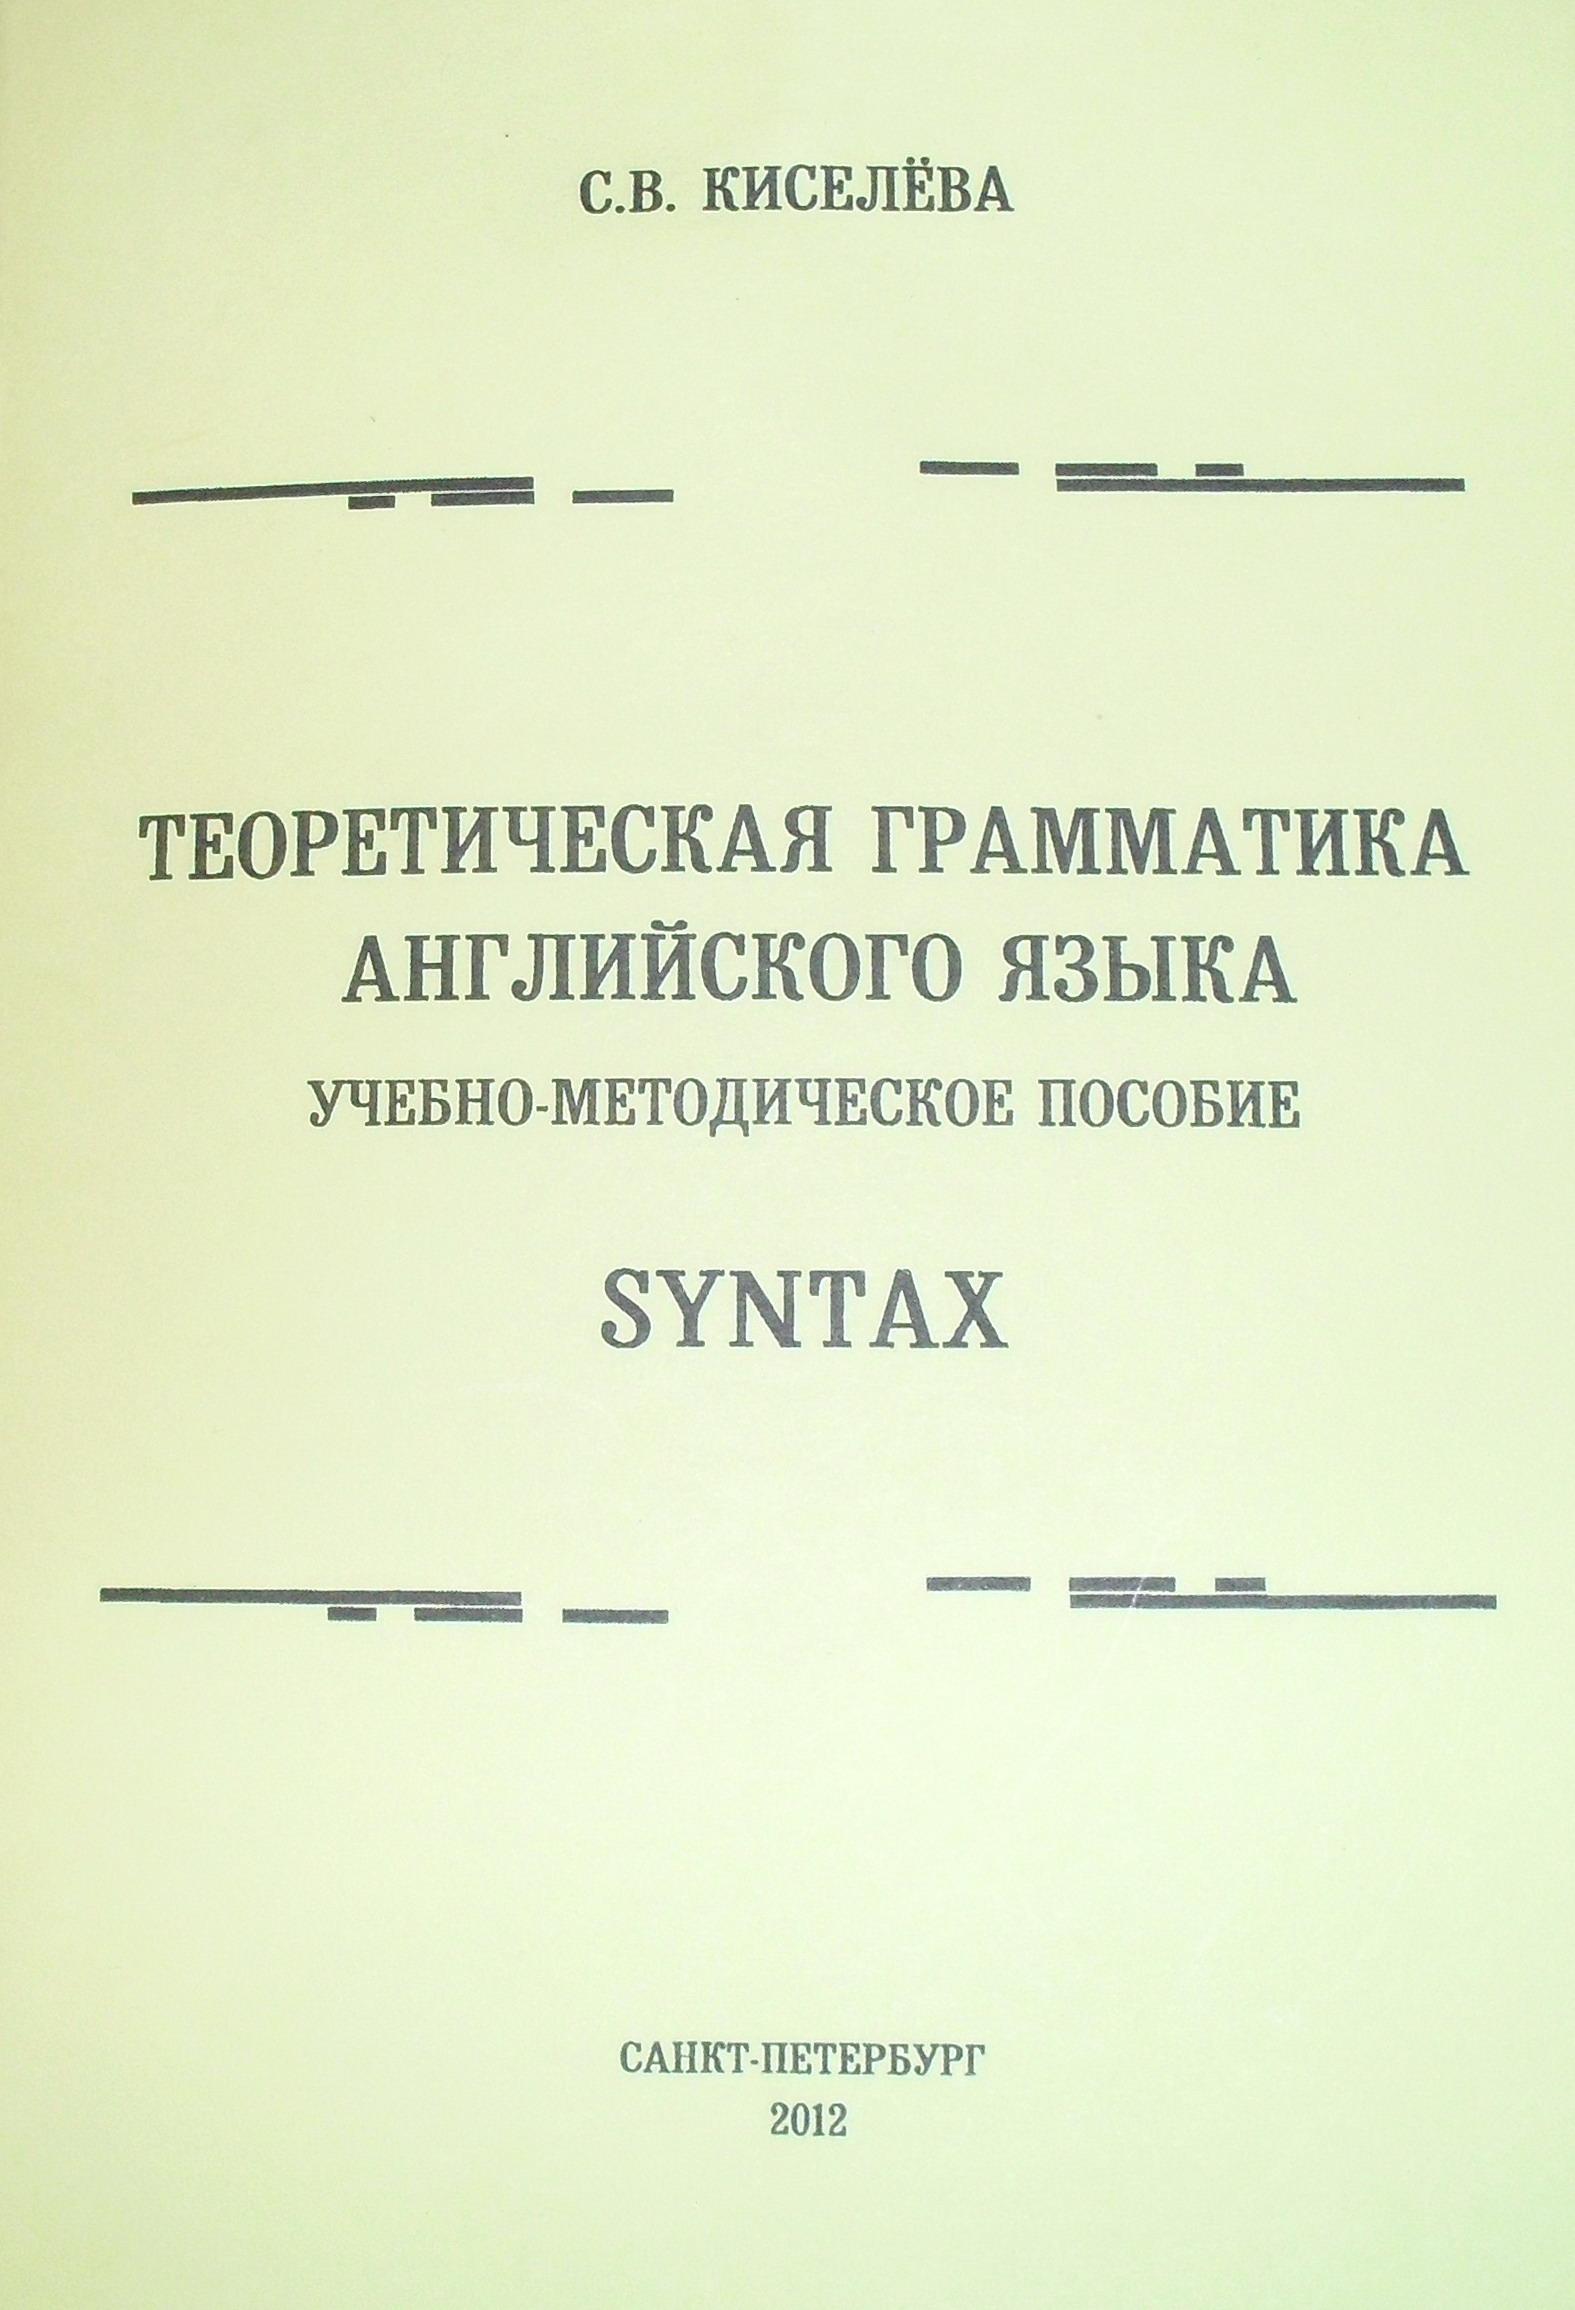 Теоретическая грамматика английского языка: SYNTAX